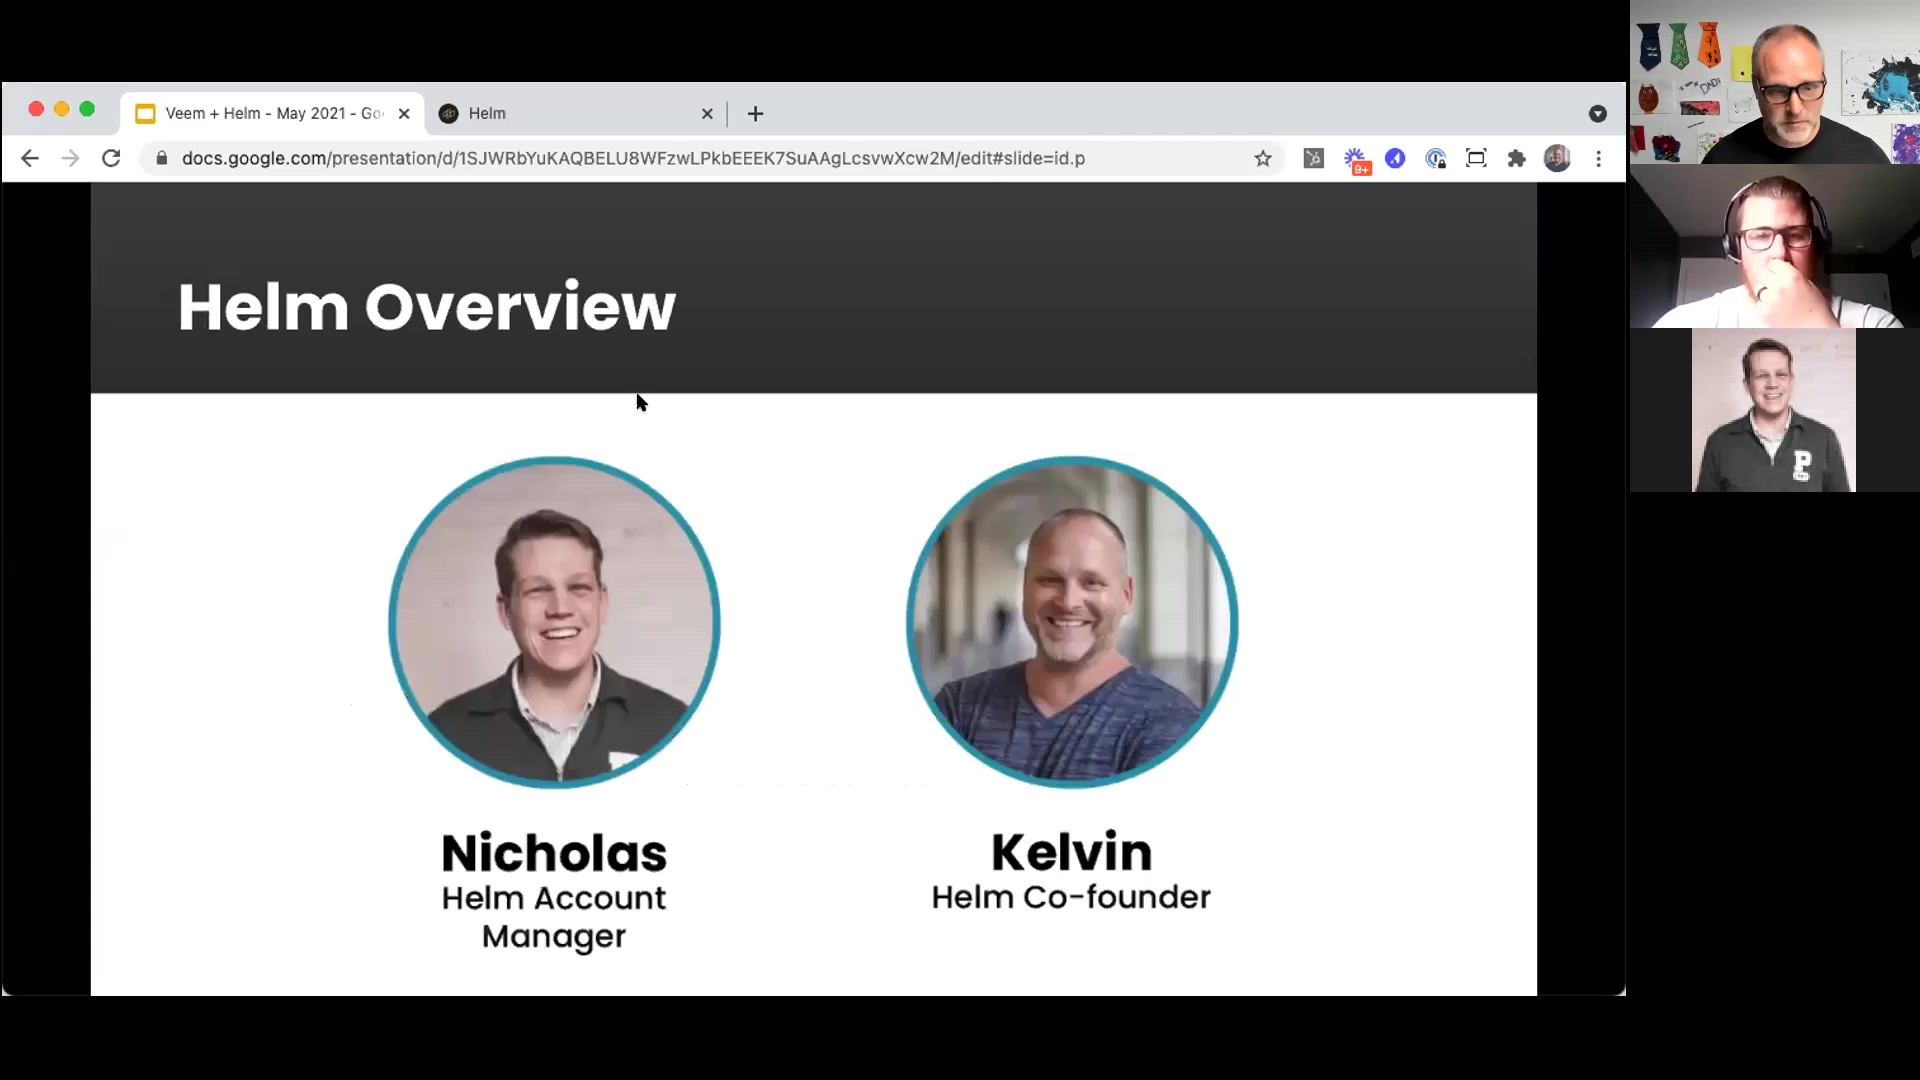 Helm + Veem Webinar - May 2021 - Helm Walkthrough